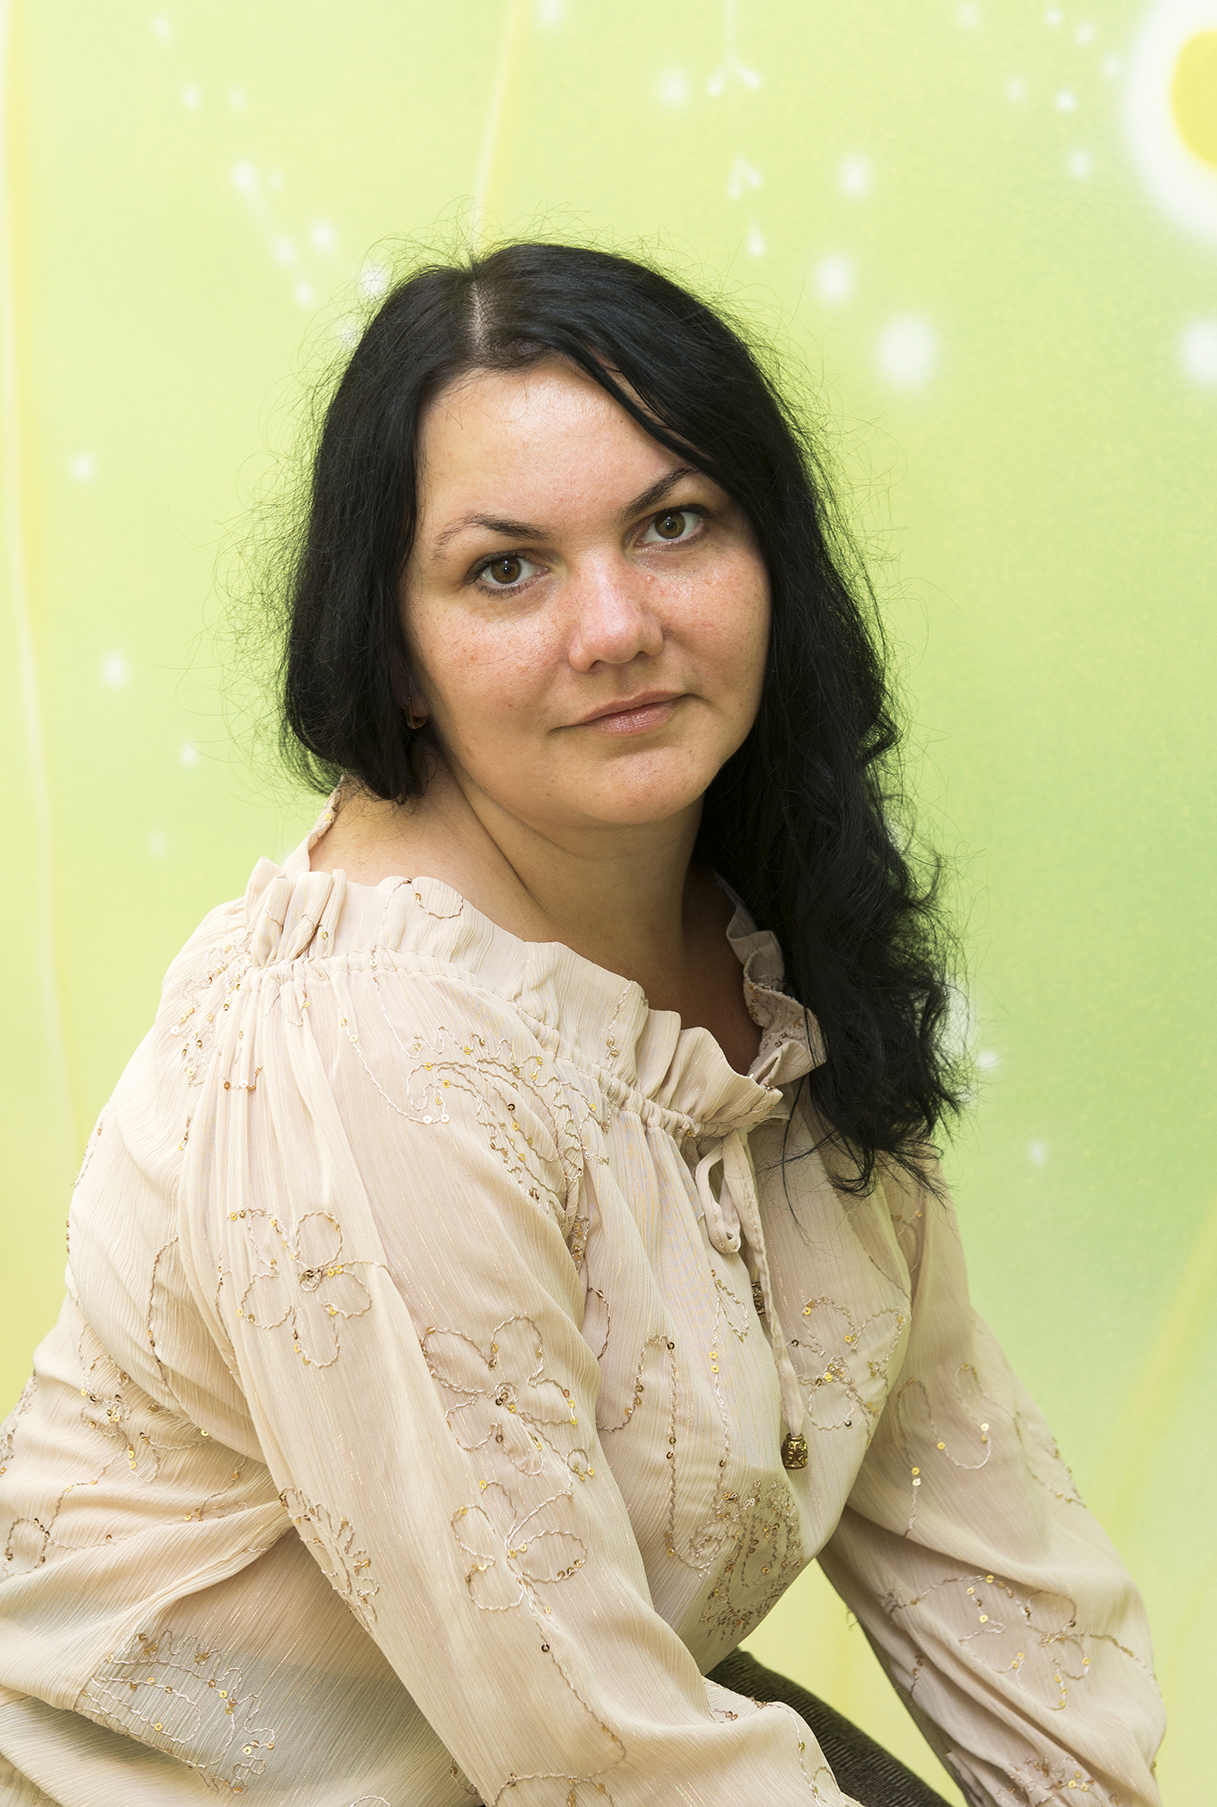 Тебякіна Тетяна Олексіївна